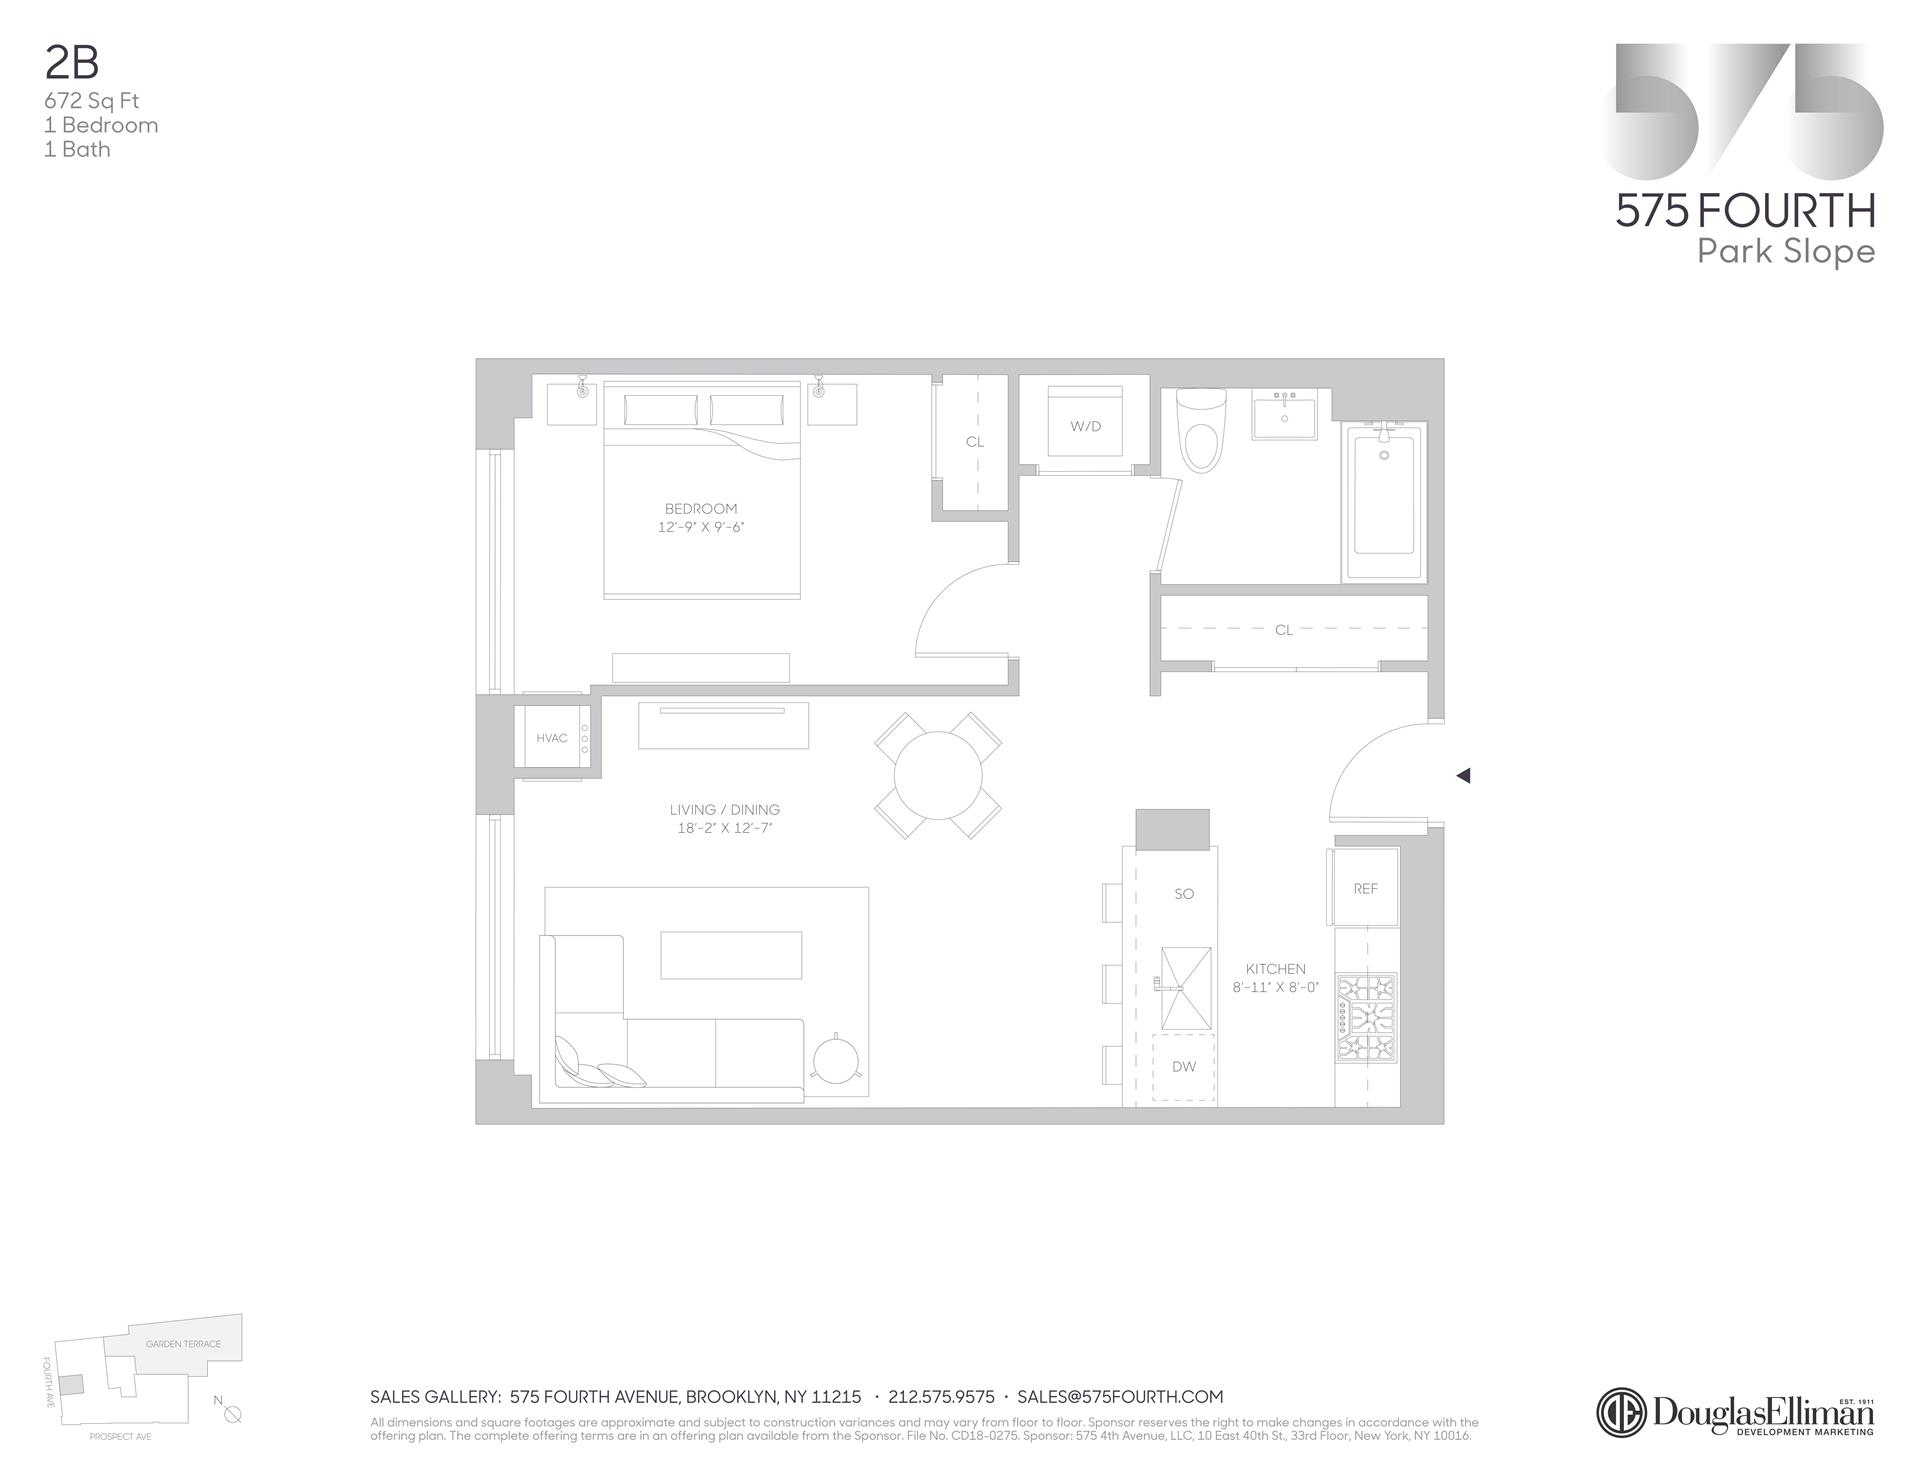 Floor plan of 575 Fourth Avenue, 2B - Park Slope, New York